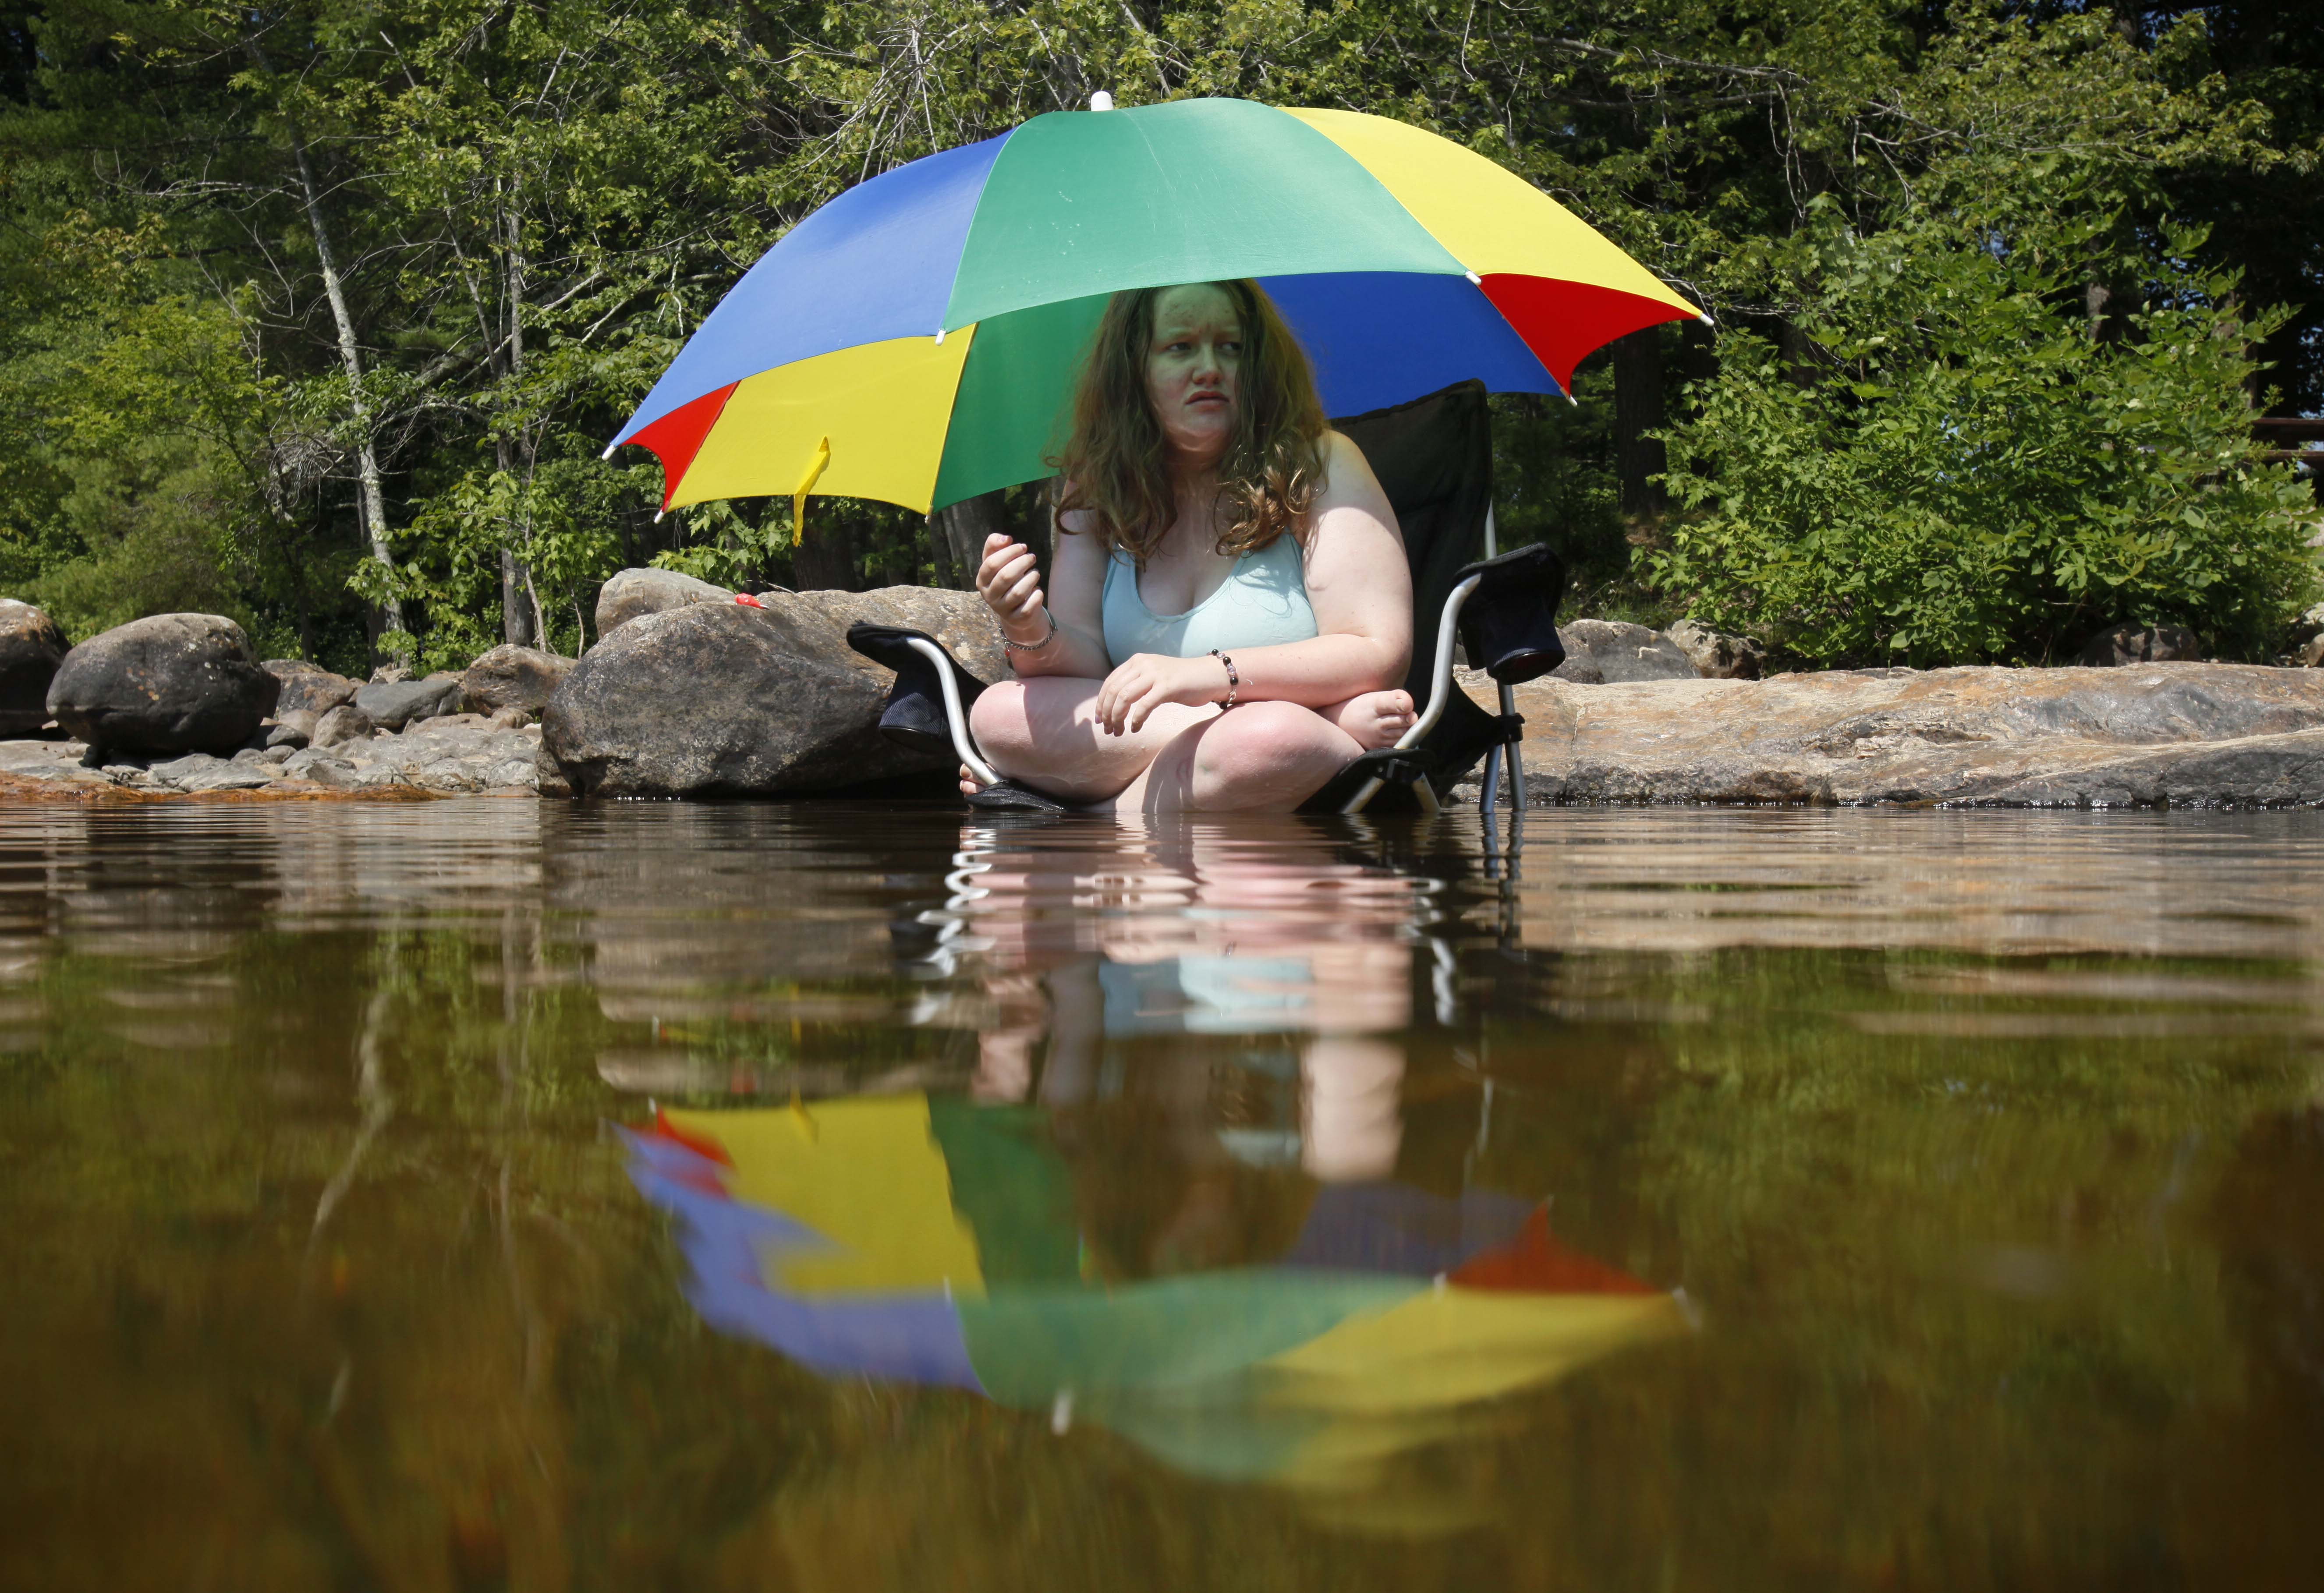 Heat wave hardest on nation's poorest communities